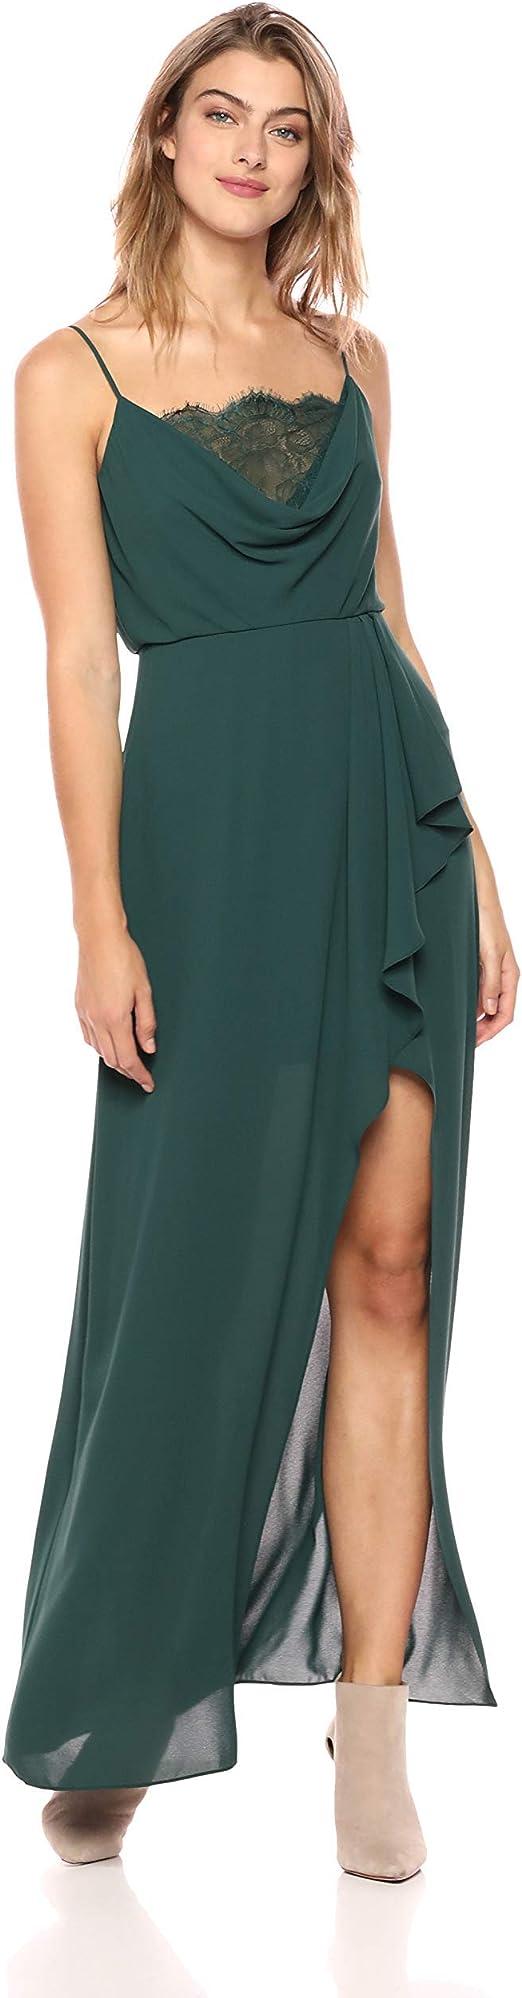 BCBG Max Azria Women/'s Ruffled Deep V-Neck Sleeveless Gown